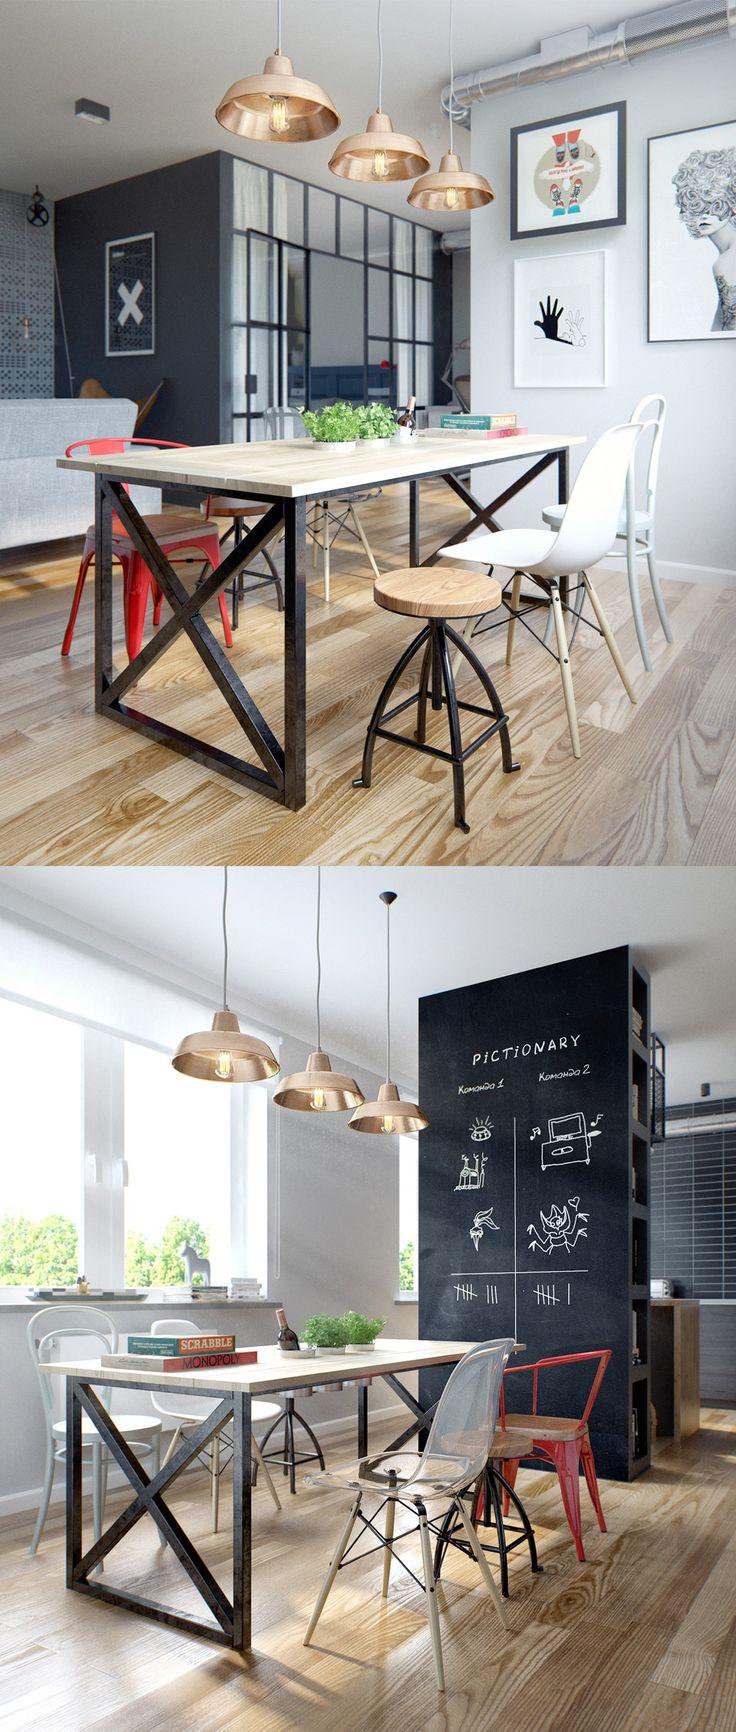 best 25 scandinavian dining rooms ideas on pinterest bright scandinavian dining room style with whimsical wall decoration